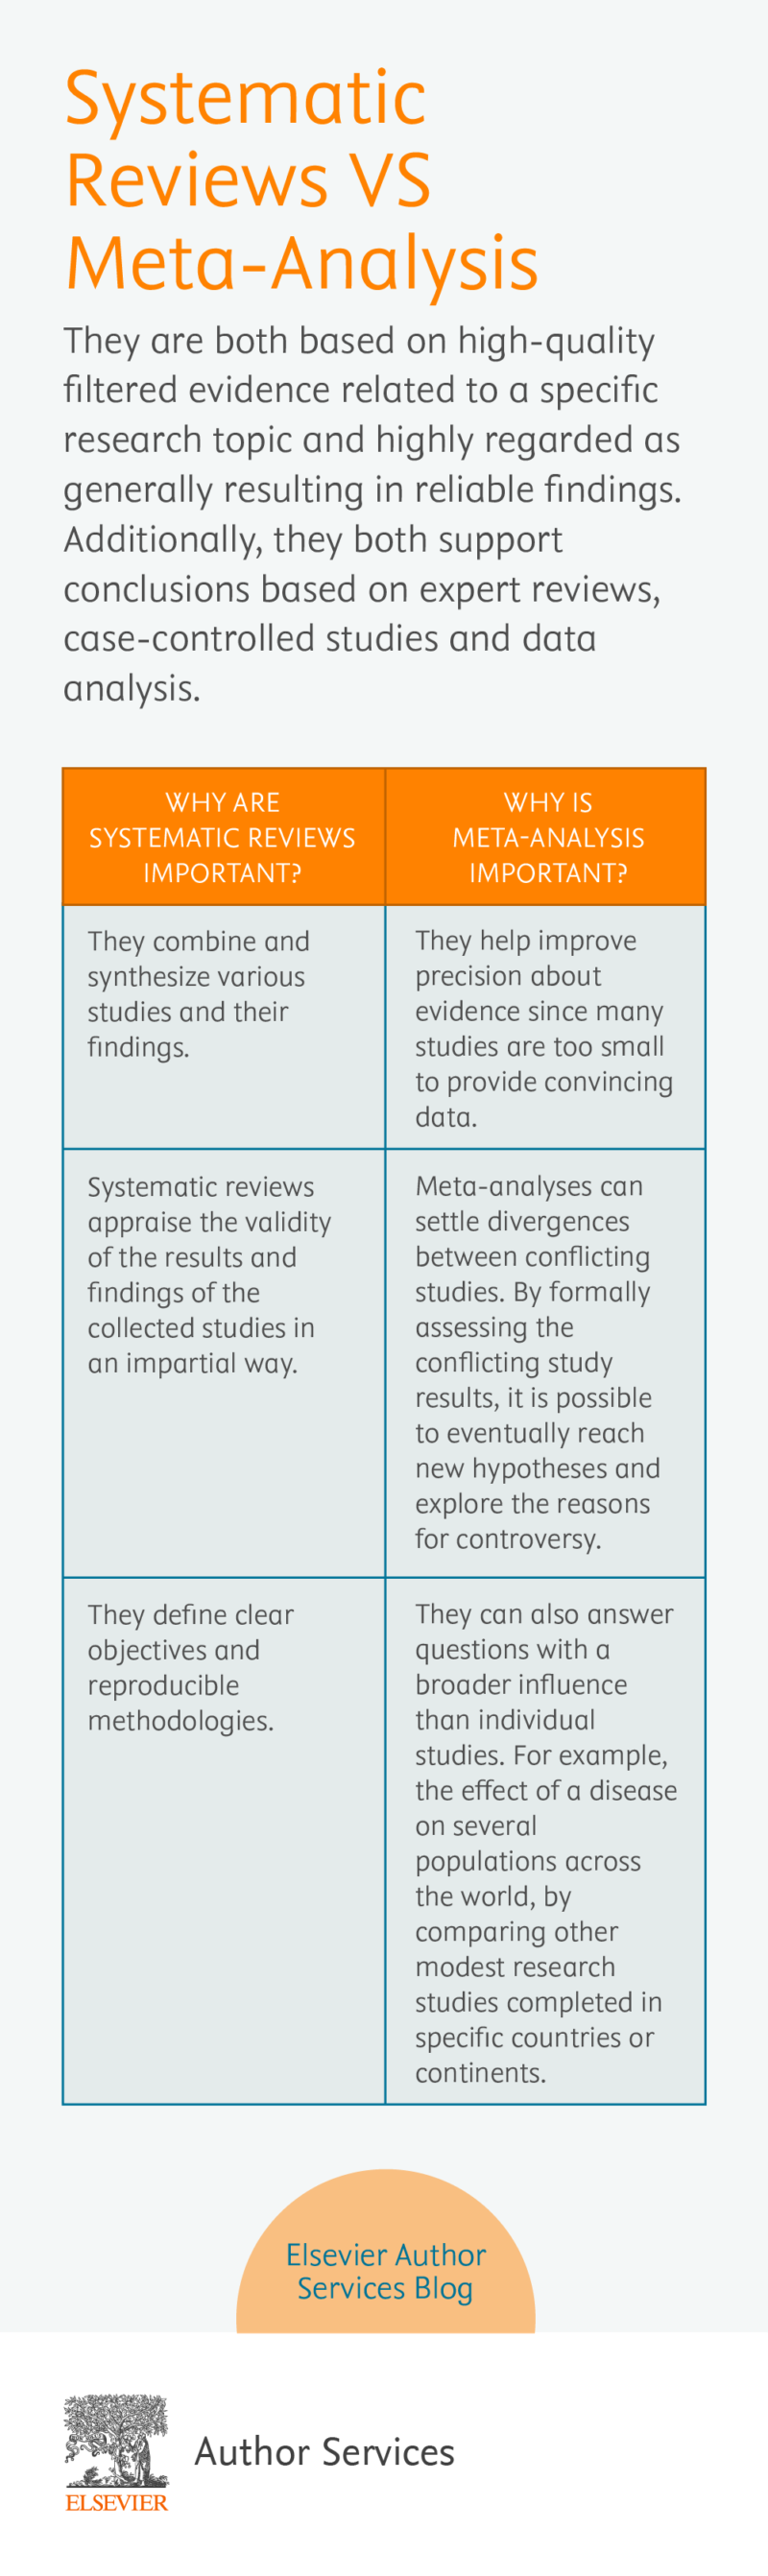 Systematic Reviews VS Meta-Analysis